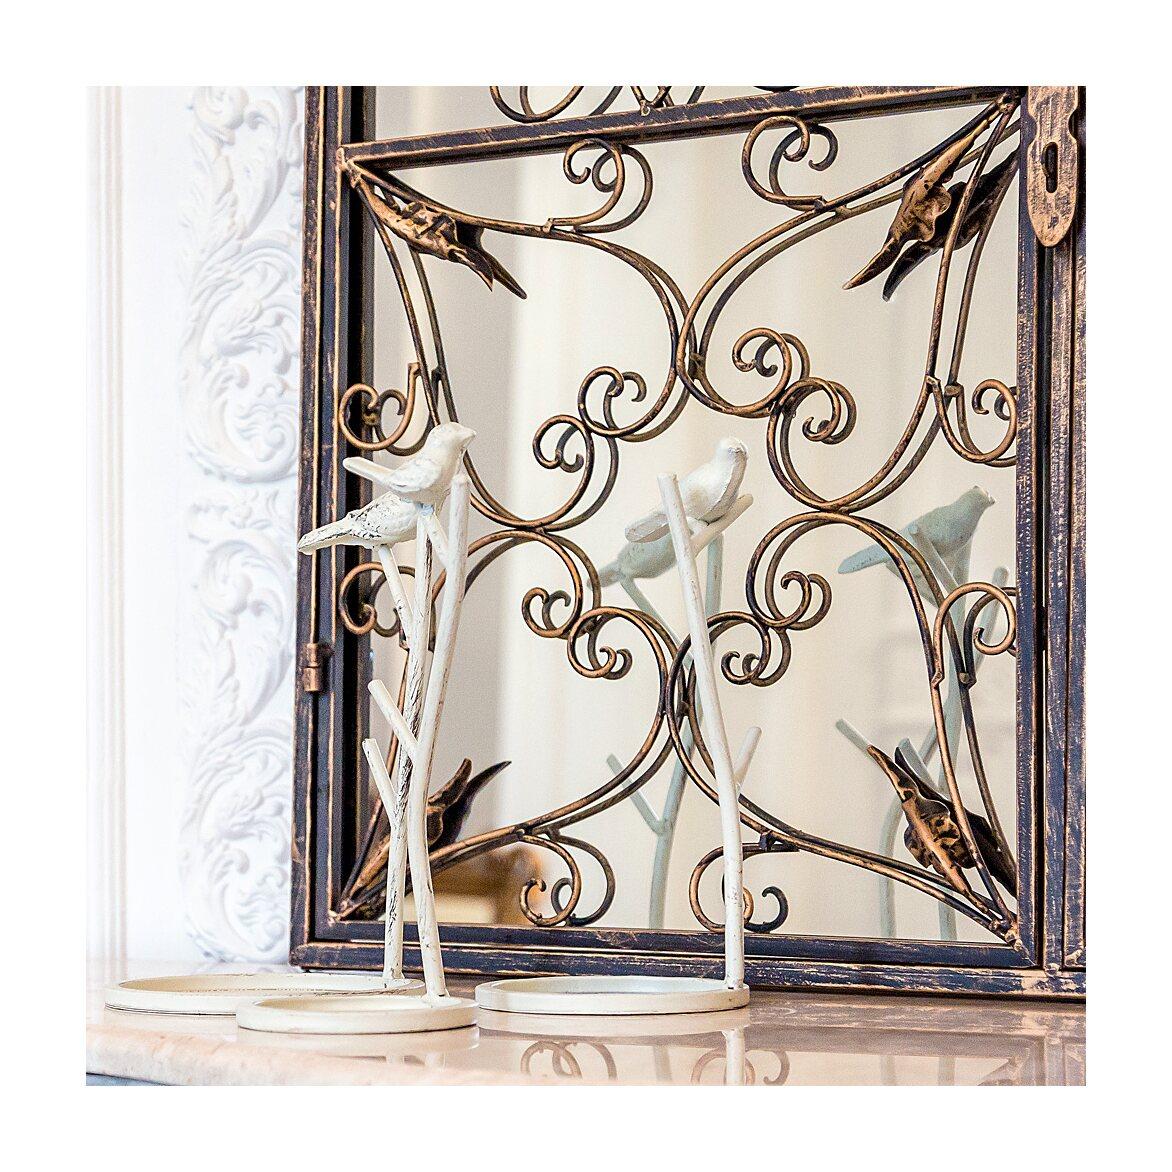 Настенное зеркало «Бизе» (королевская бронза) 5   Настенные зеркала Kingsby